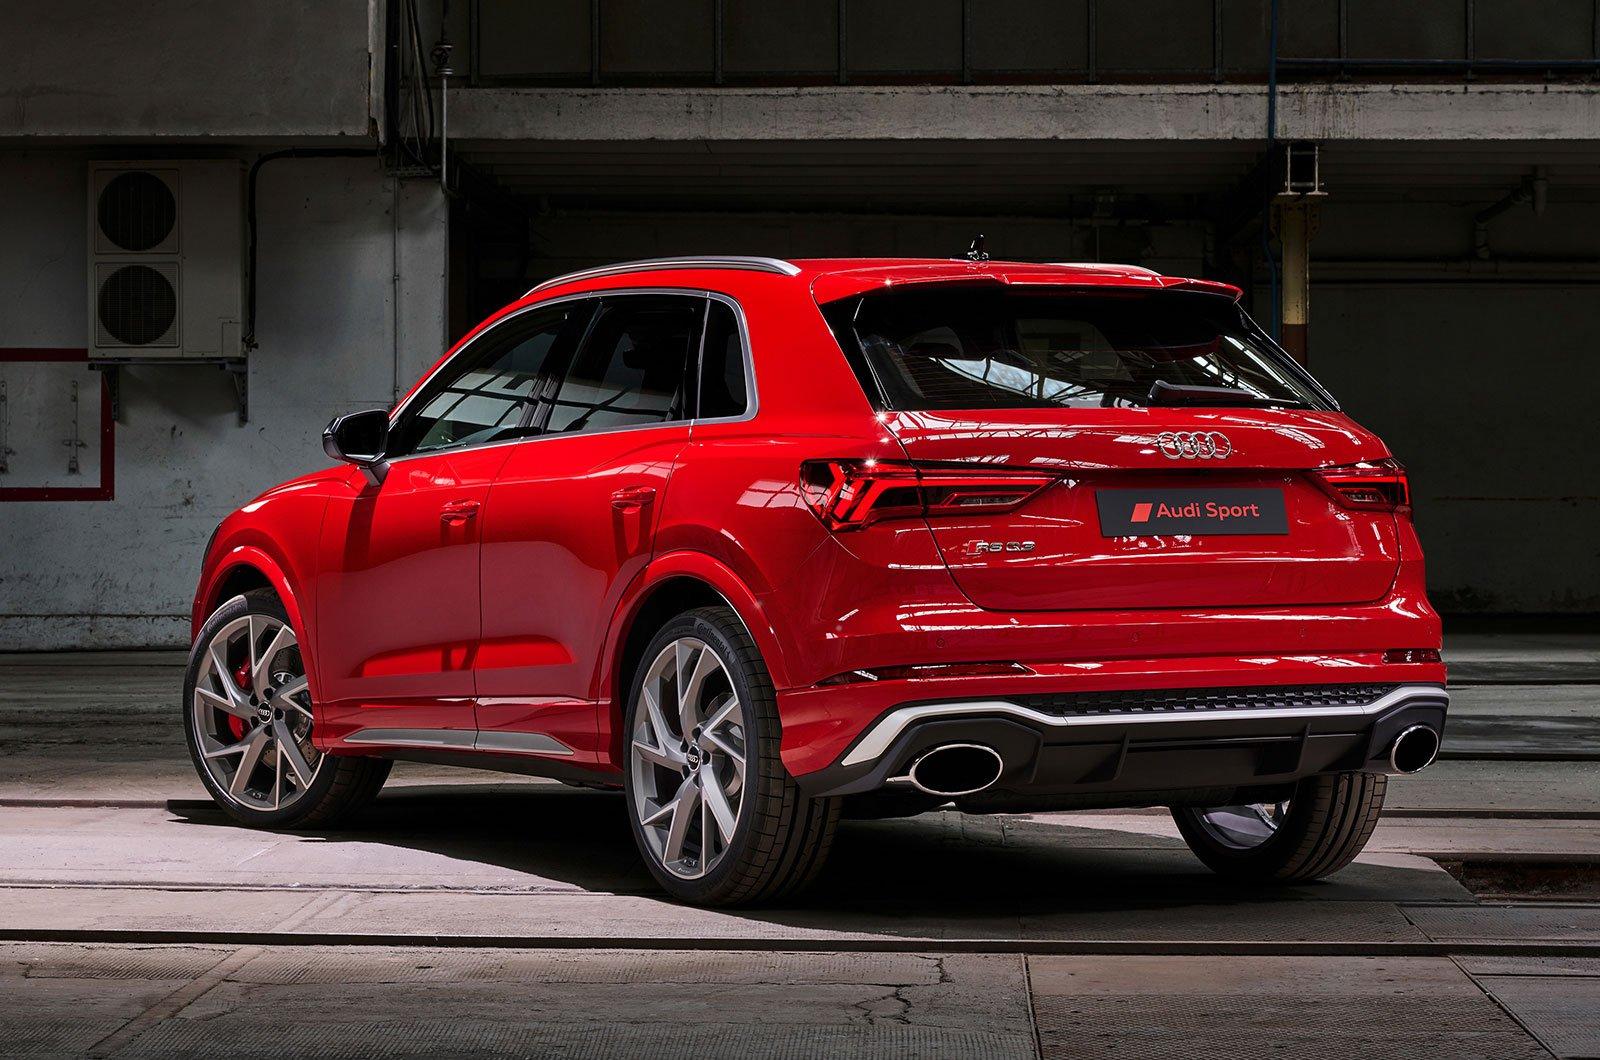 Audi RS Q3 rear